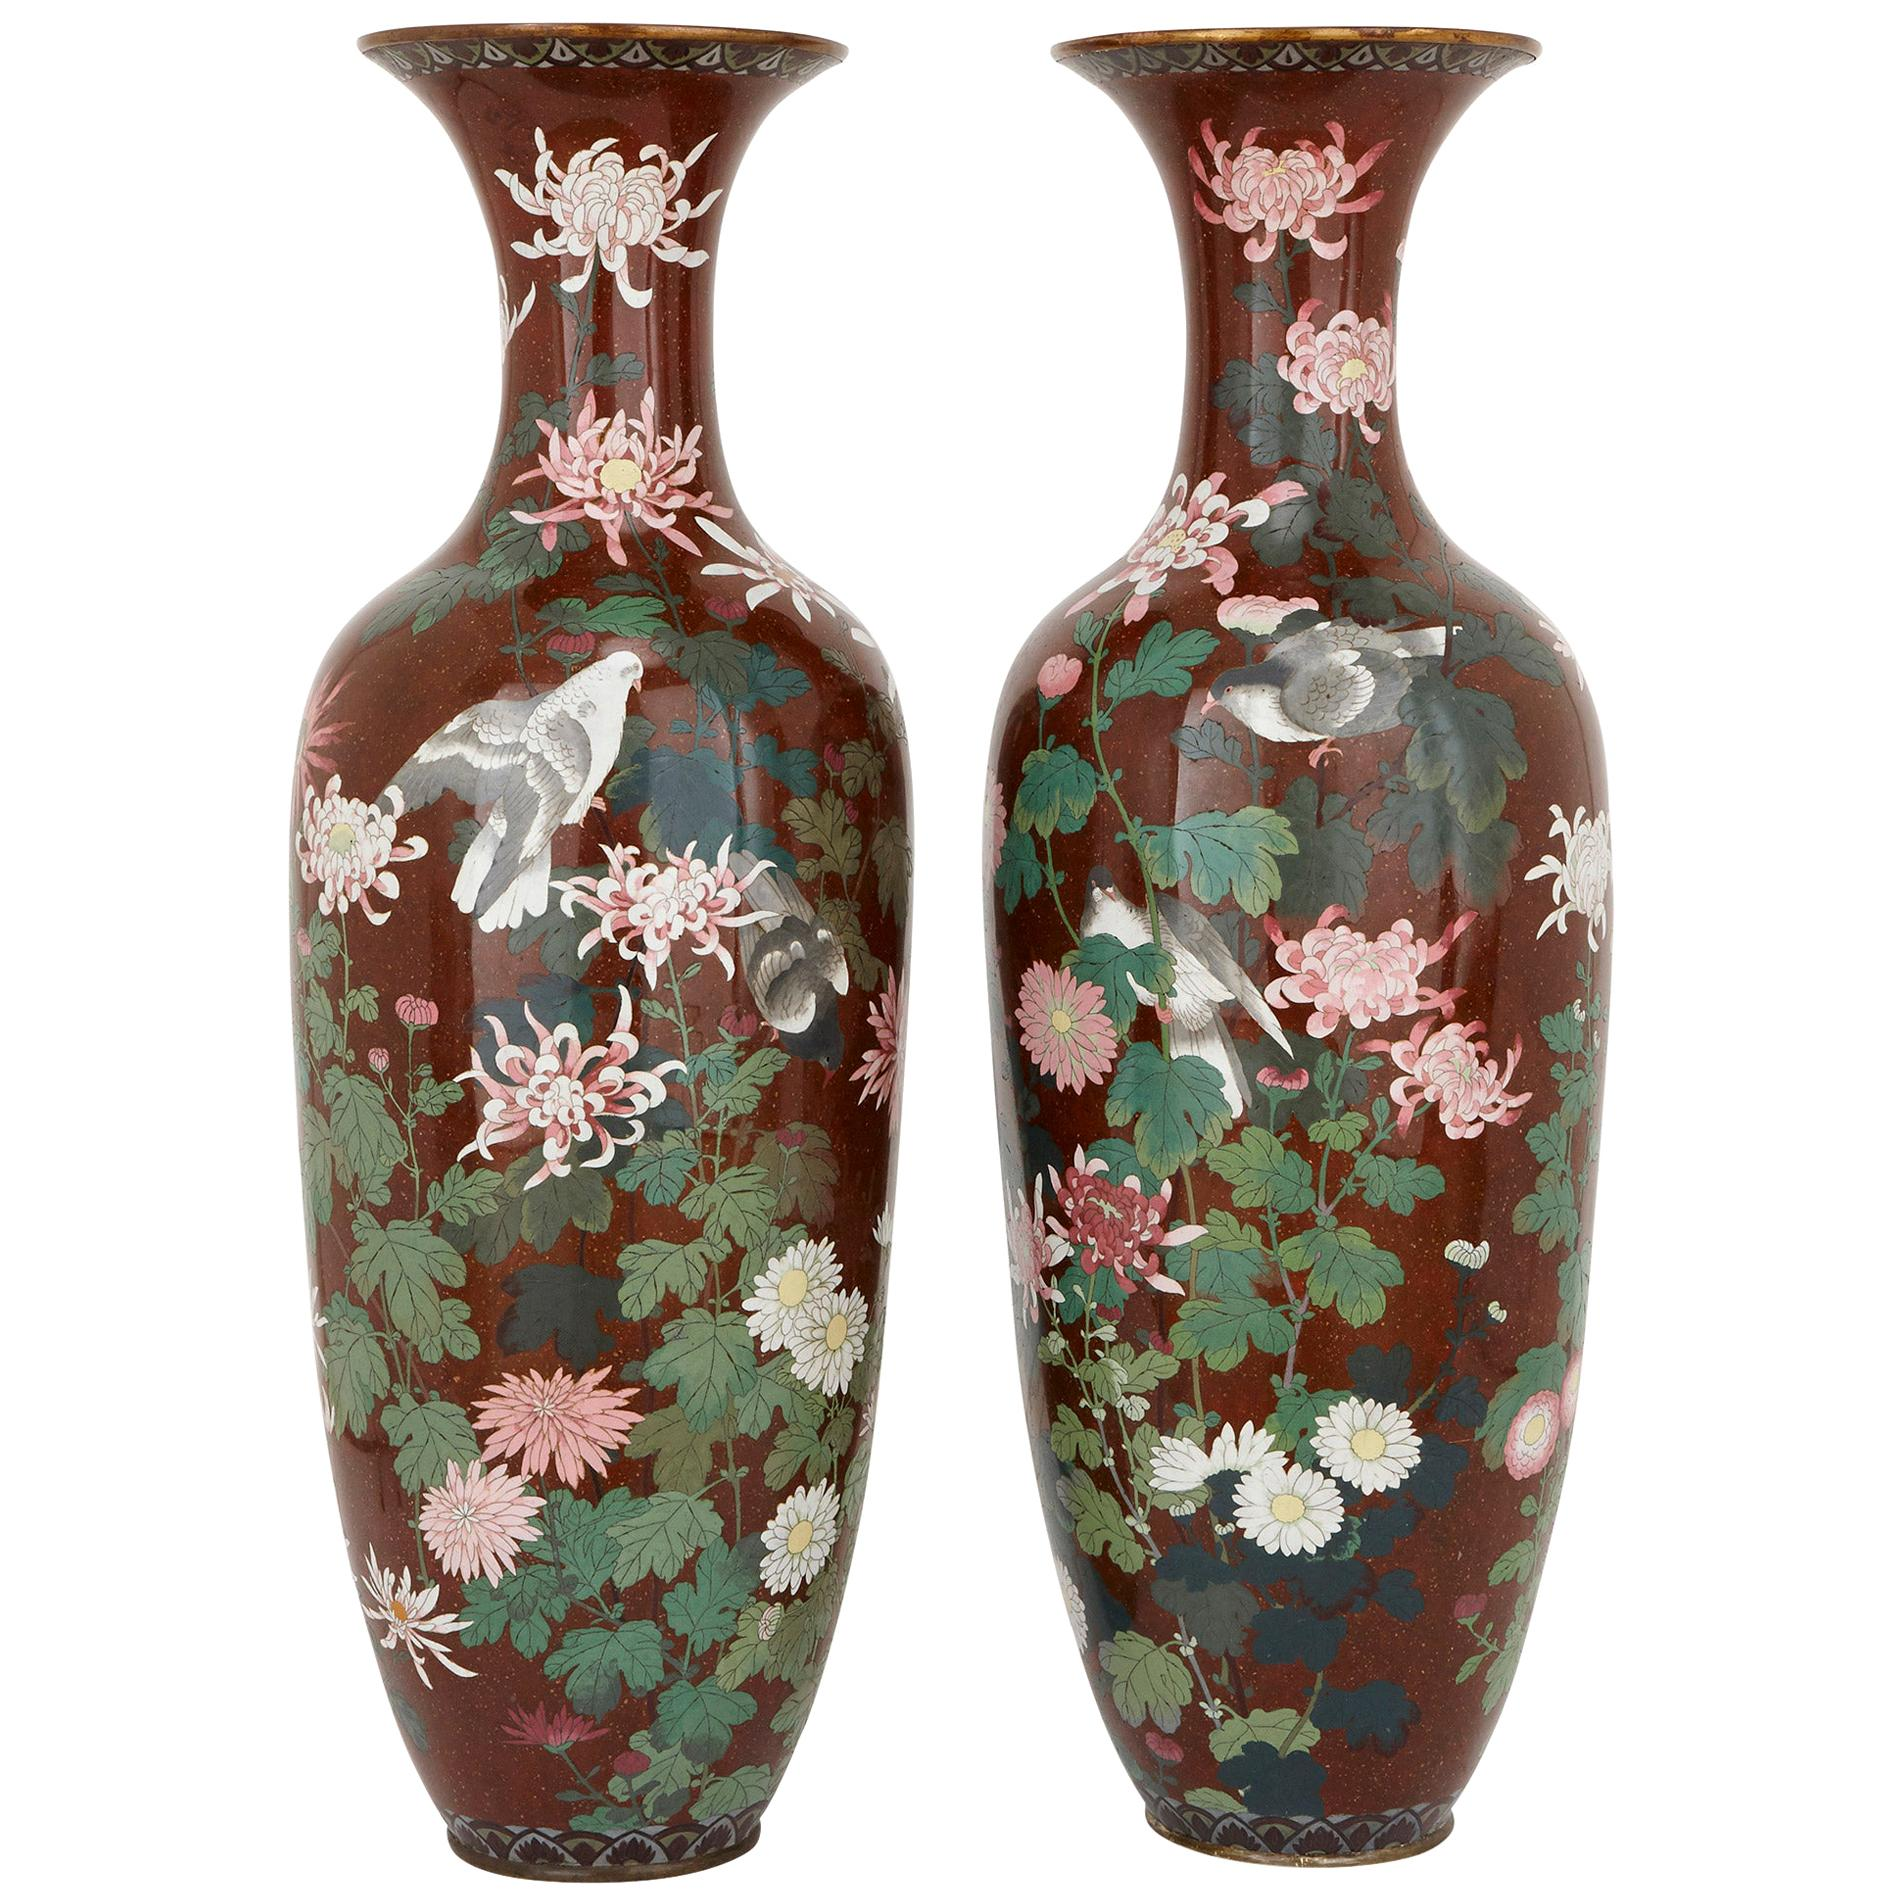 Pair of Antique Meiji Period Japanese Cloisonne Enamel Vases